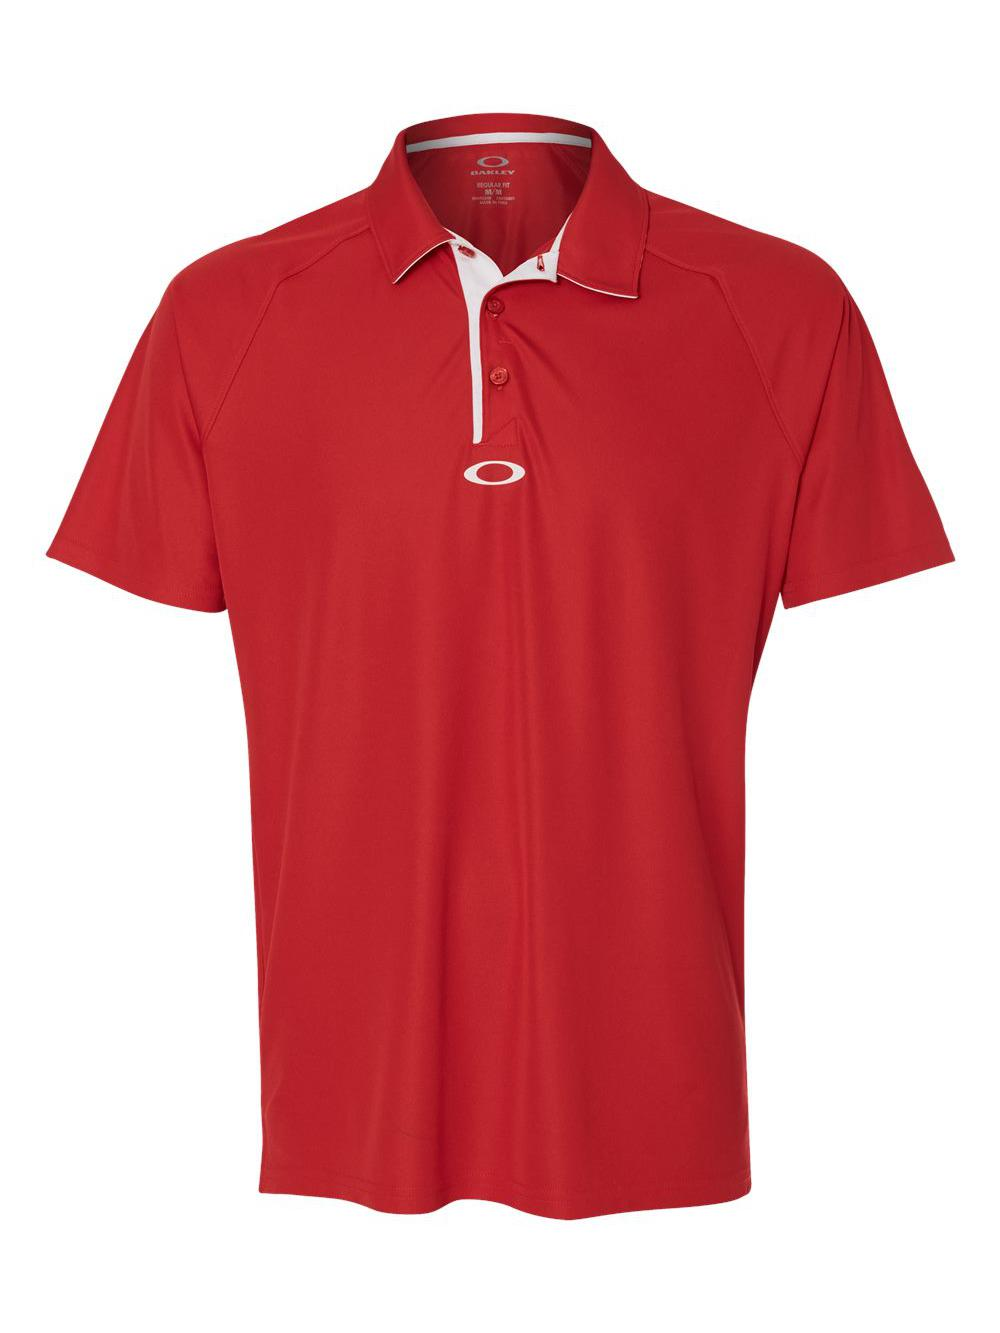 Oakley-Elemental-2-0-Sport-Shirt-432632ODM thumbnail 6